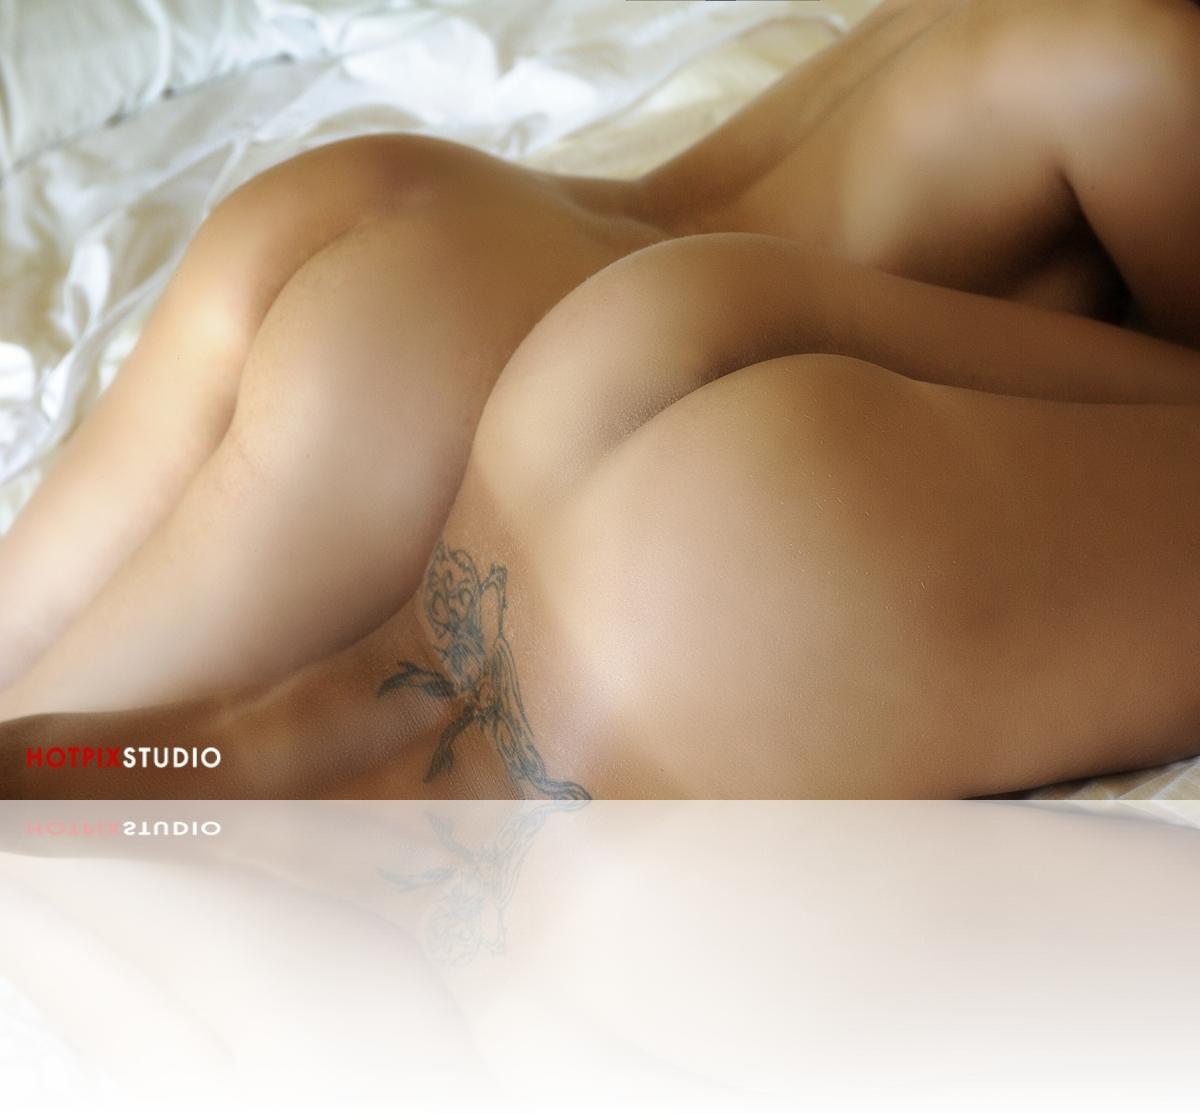 Duo-Photography-HotPix-Miami-Escort-Photo-Studio-40.jpg